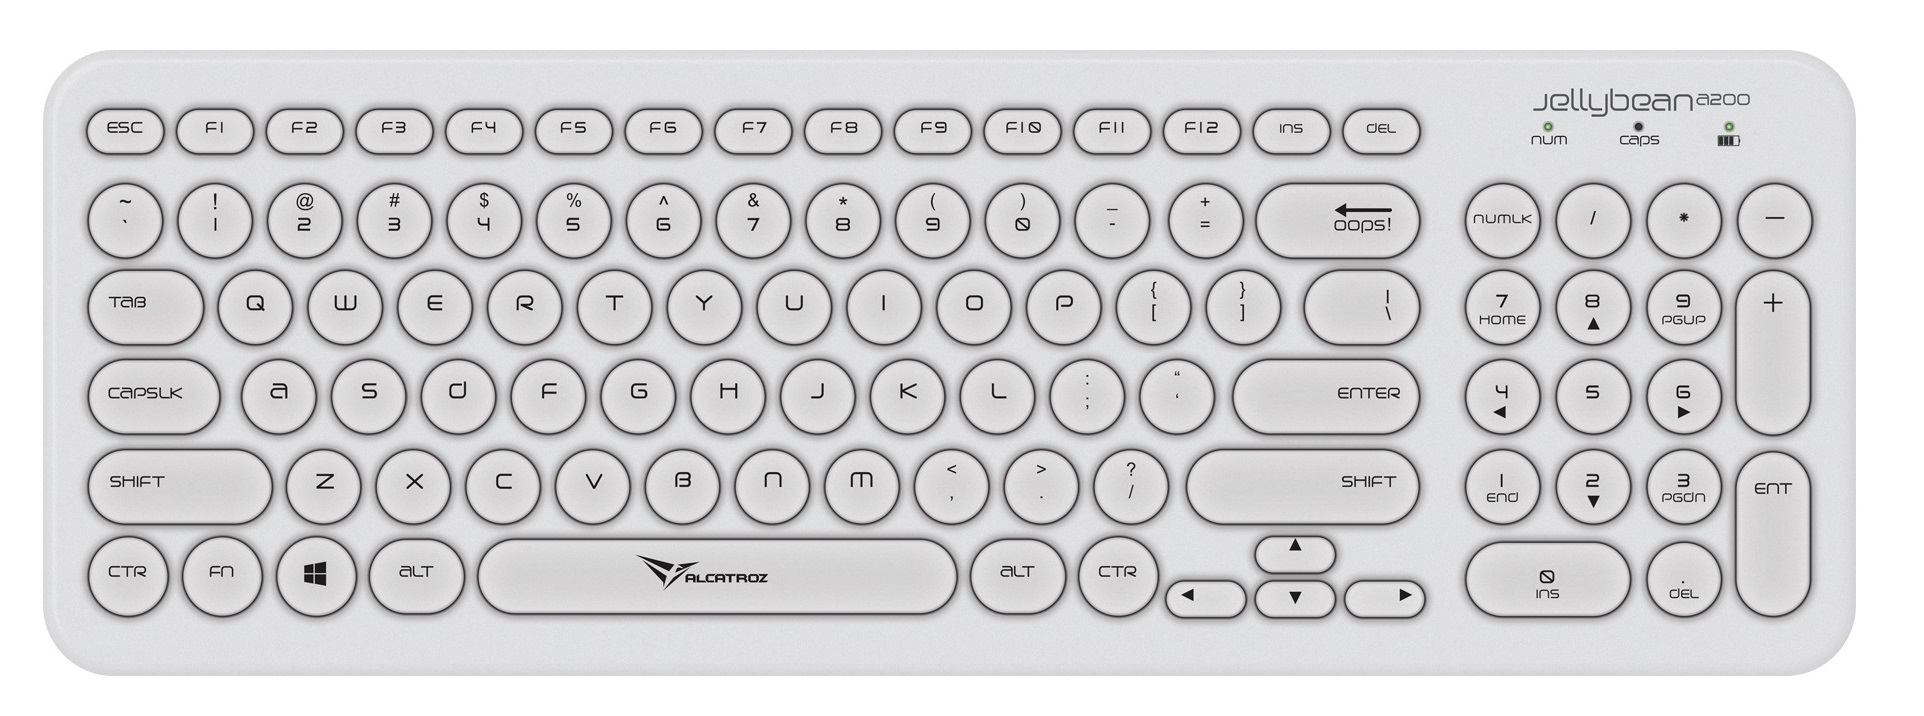 Alcatroz Jellybean A200 Wireless Keyboard White